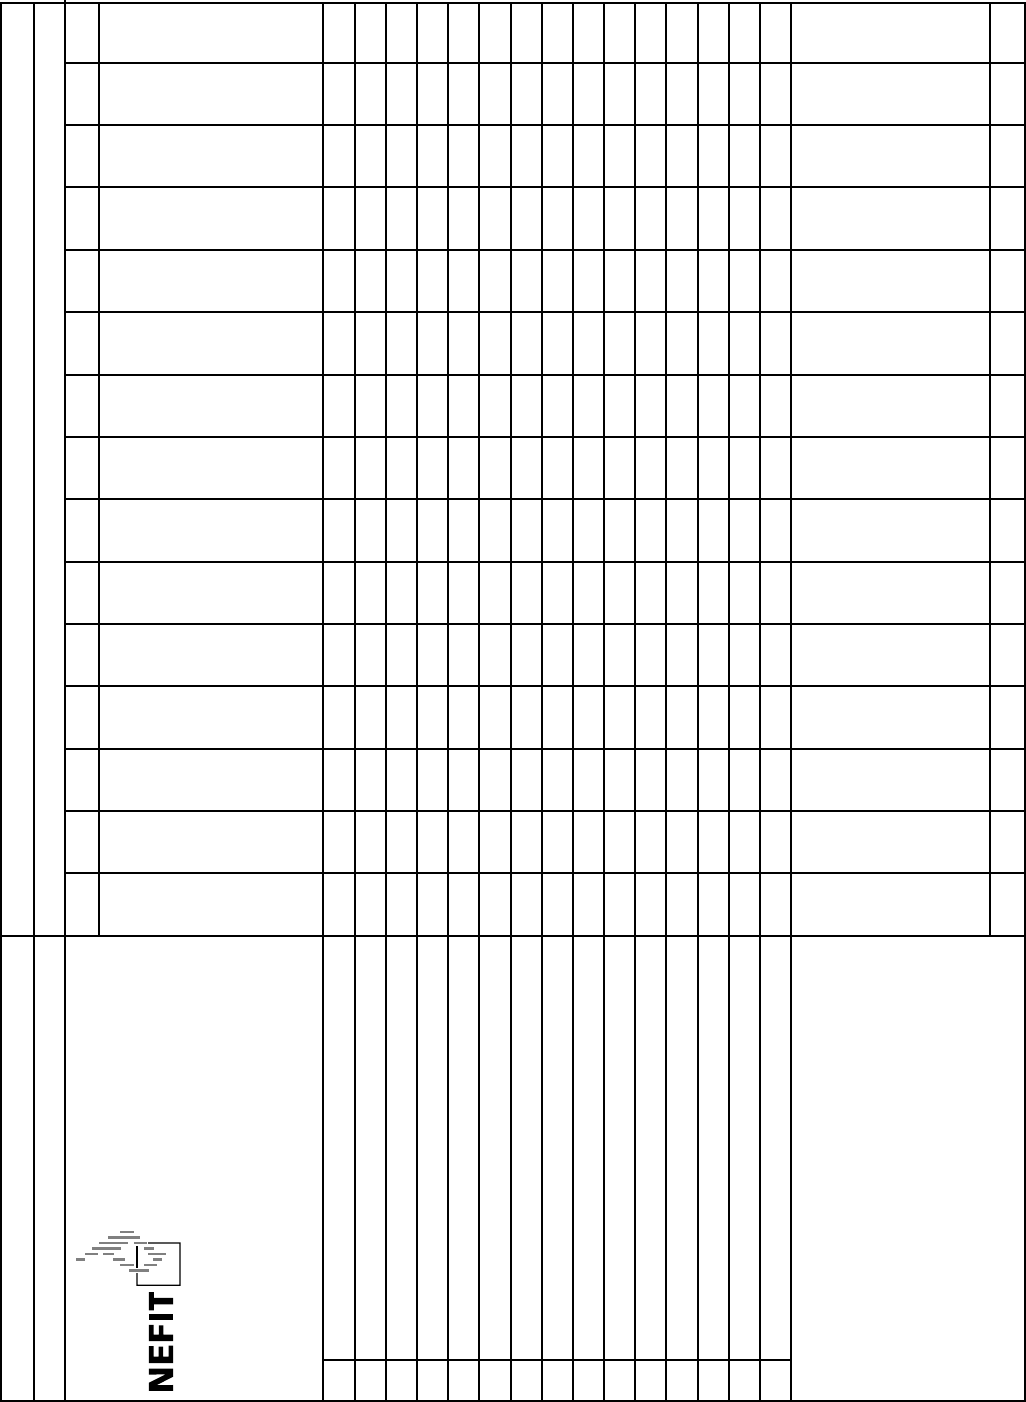 30d4a77d50c Handleiding Nefit Ecomline HR Classic (pagina 51 van 52) (Nederlands)